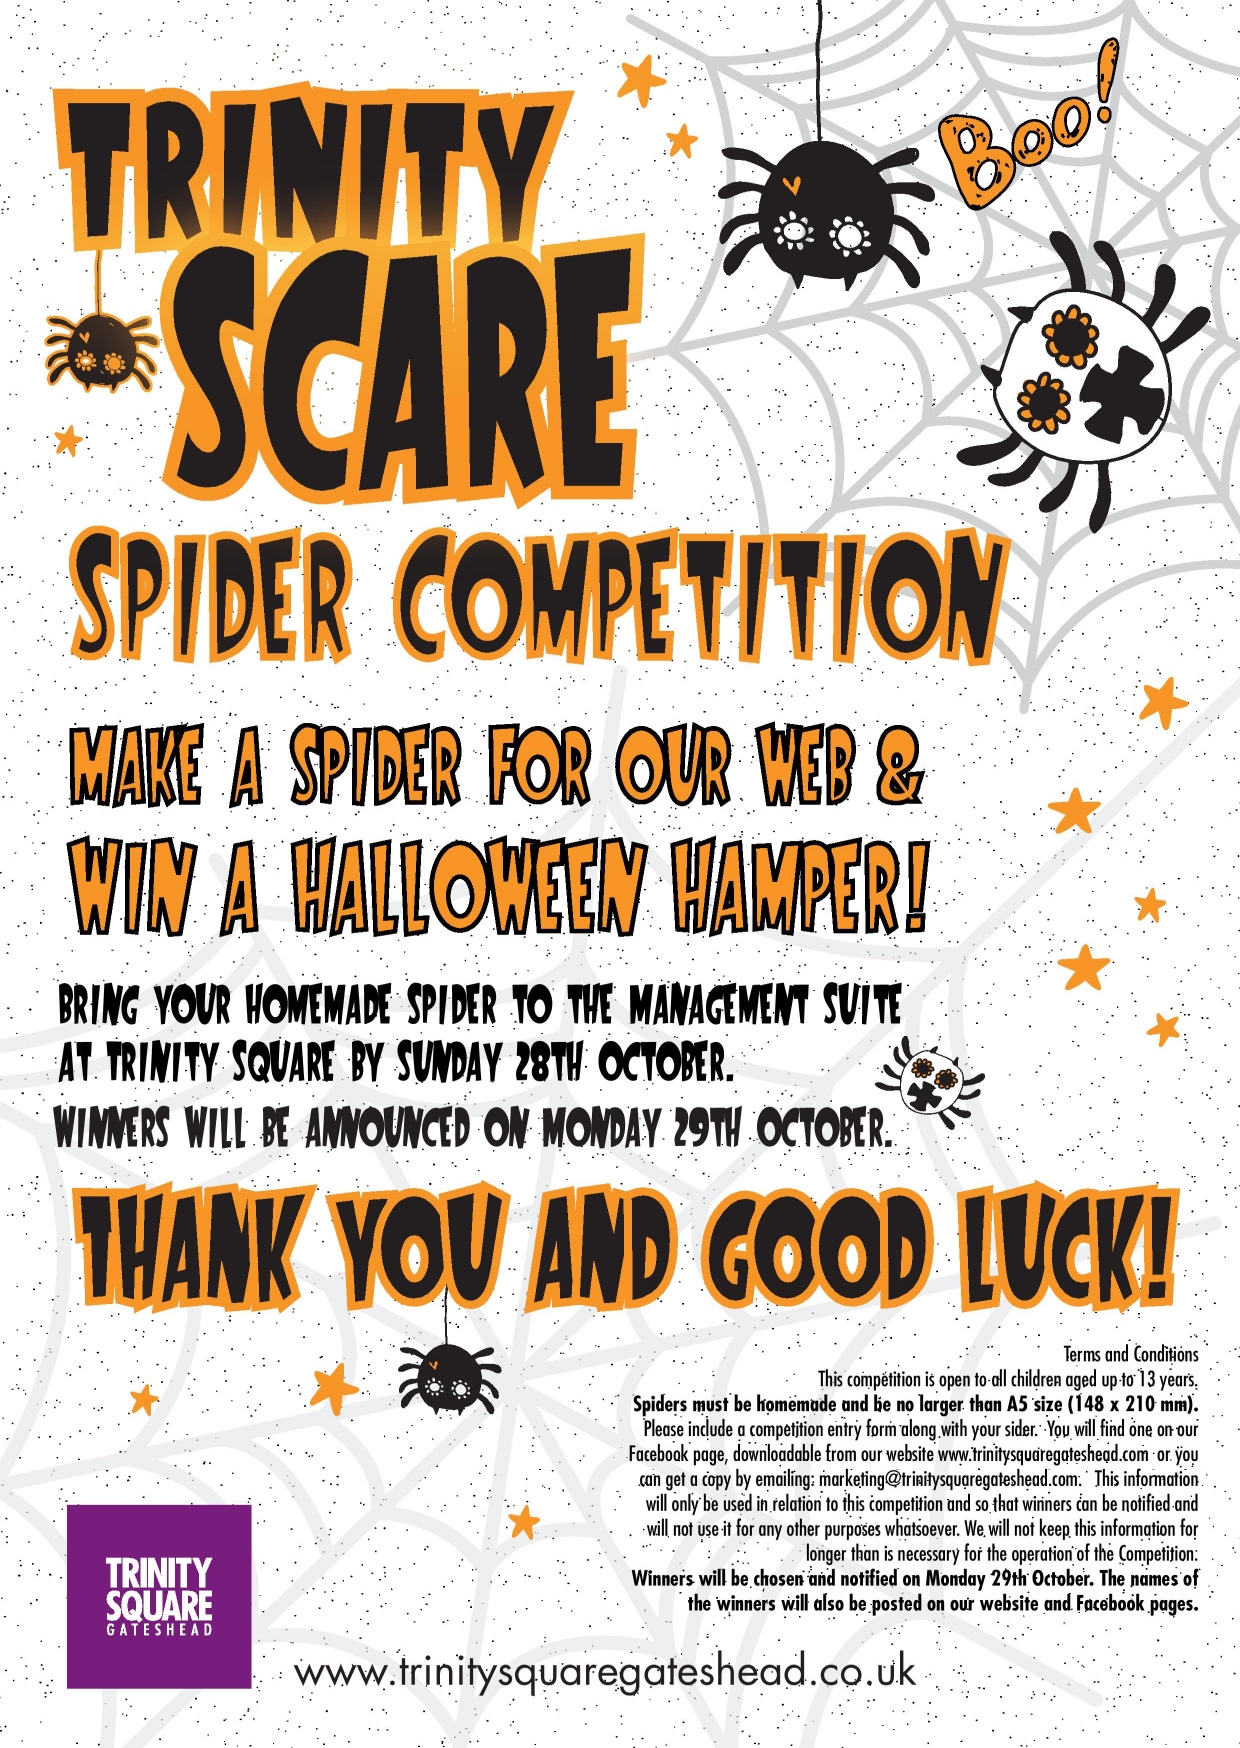 Win a Halloween Hamper!